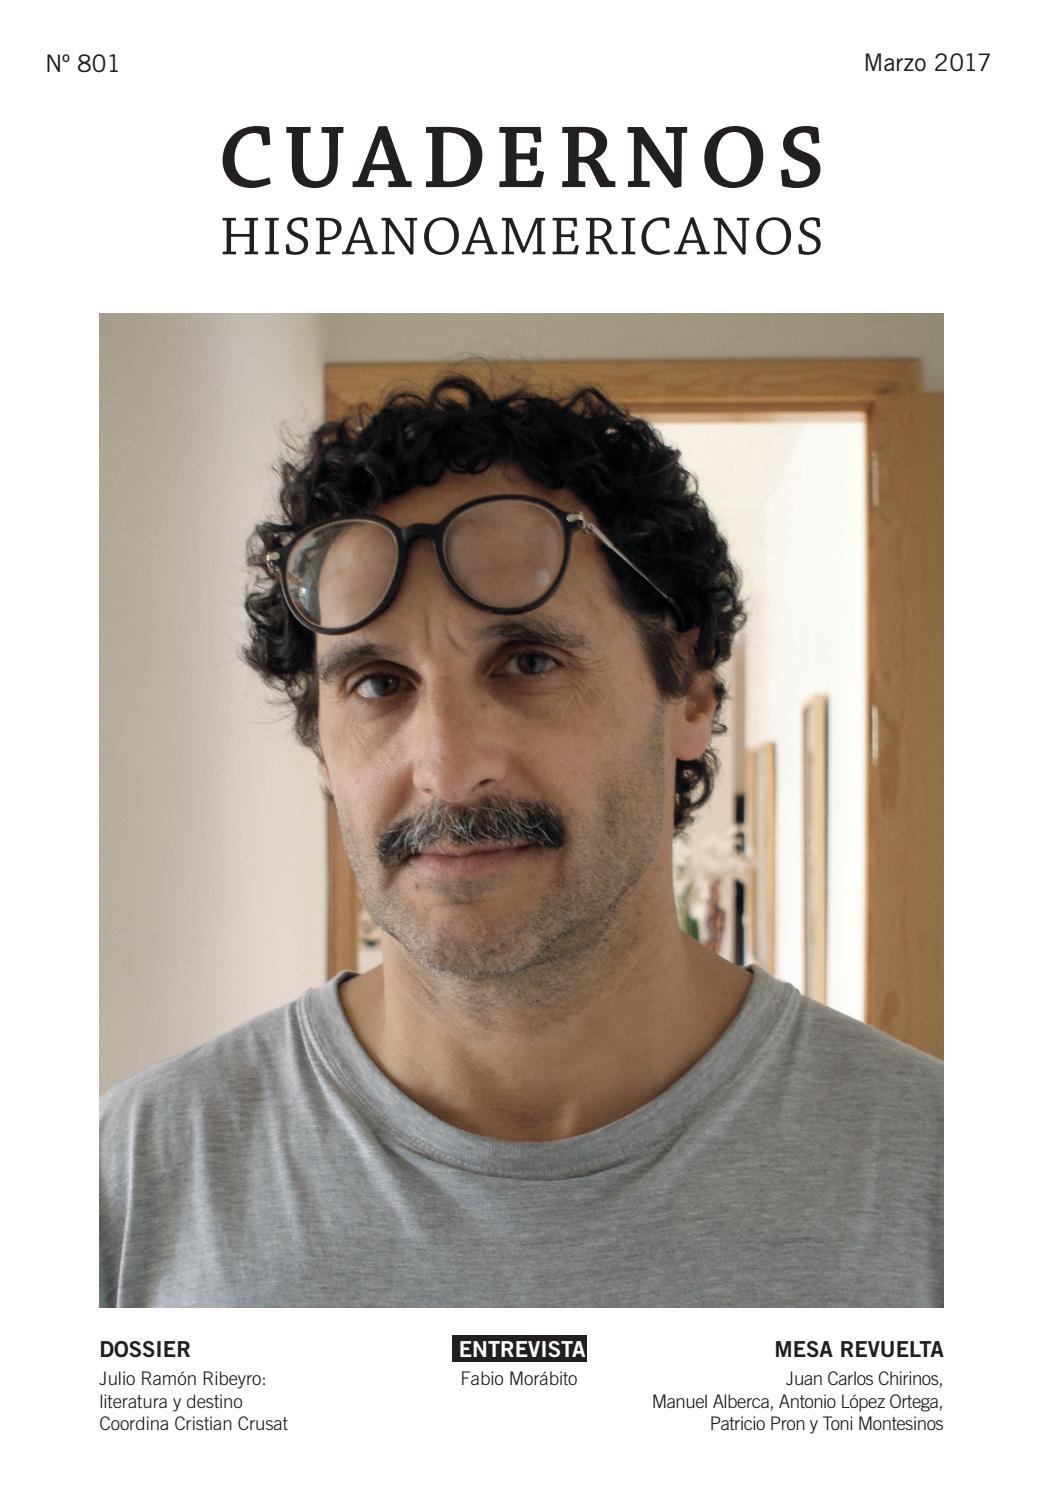 Cuadernos Hispanoamericanos (nº 801 8fdcd3270e808